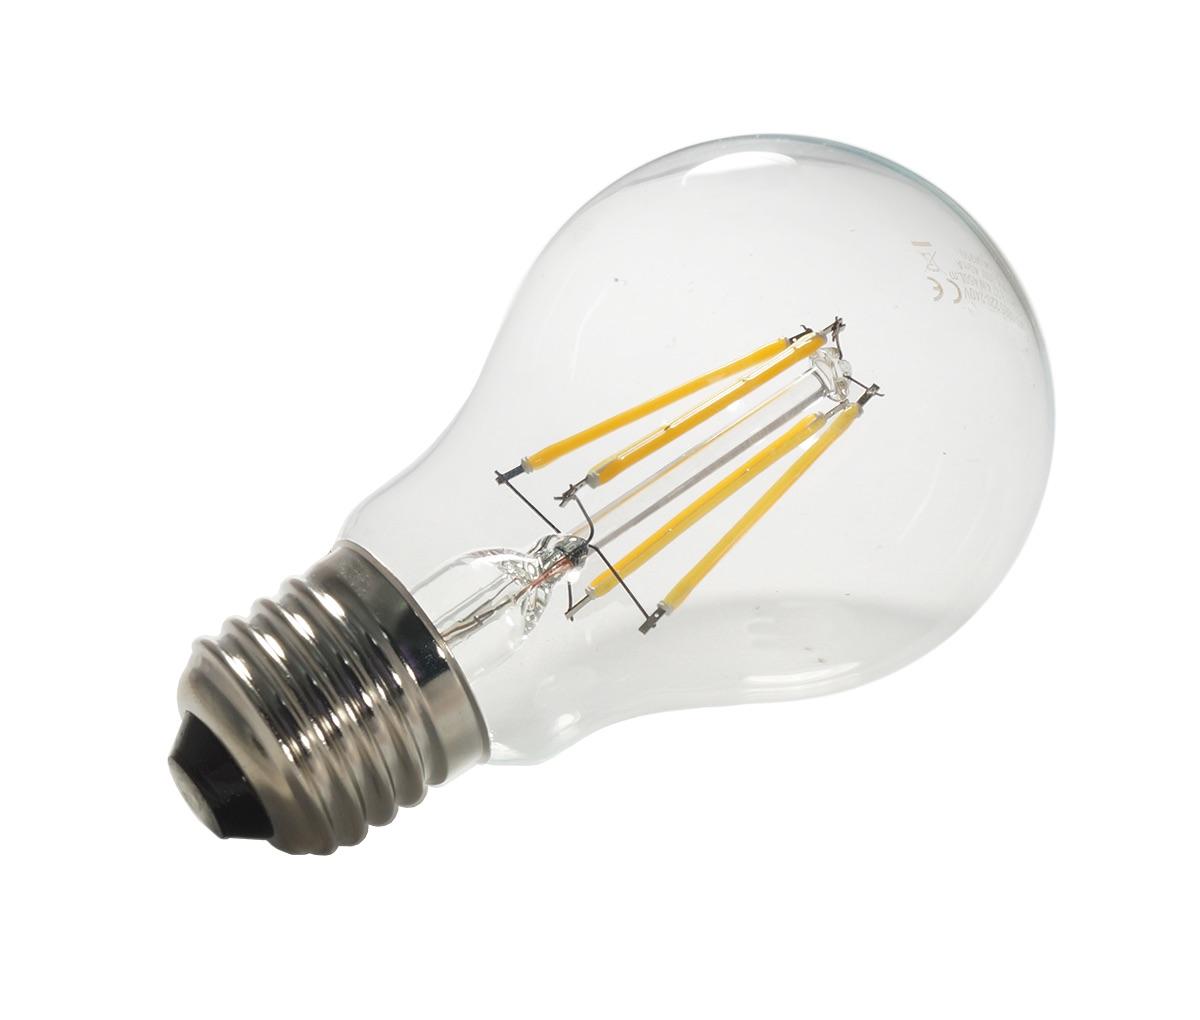 Effetti del forum le lampadine a led pagina 1 casa for Lampadine casa led